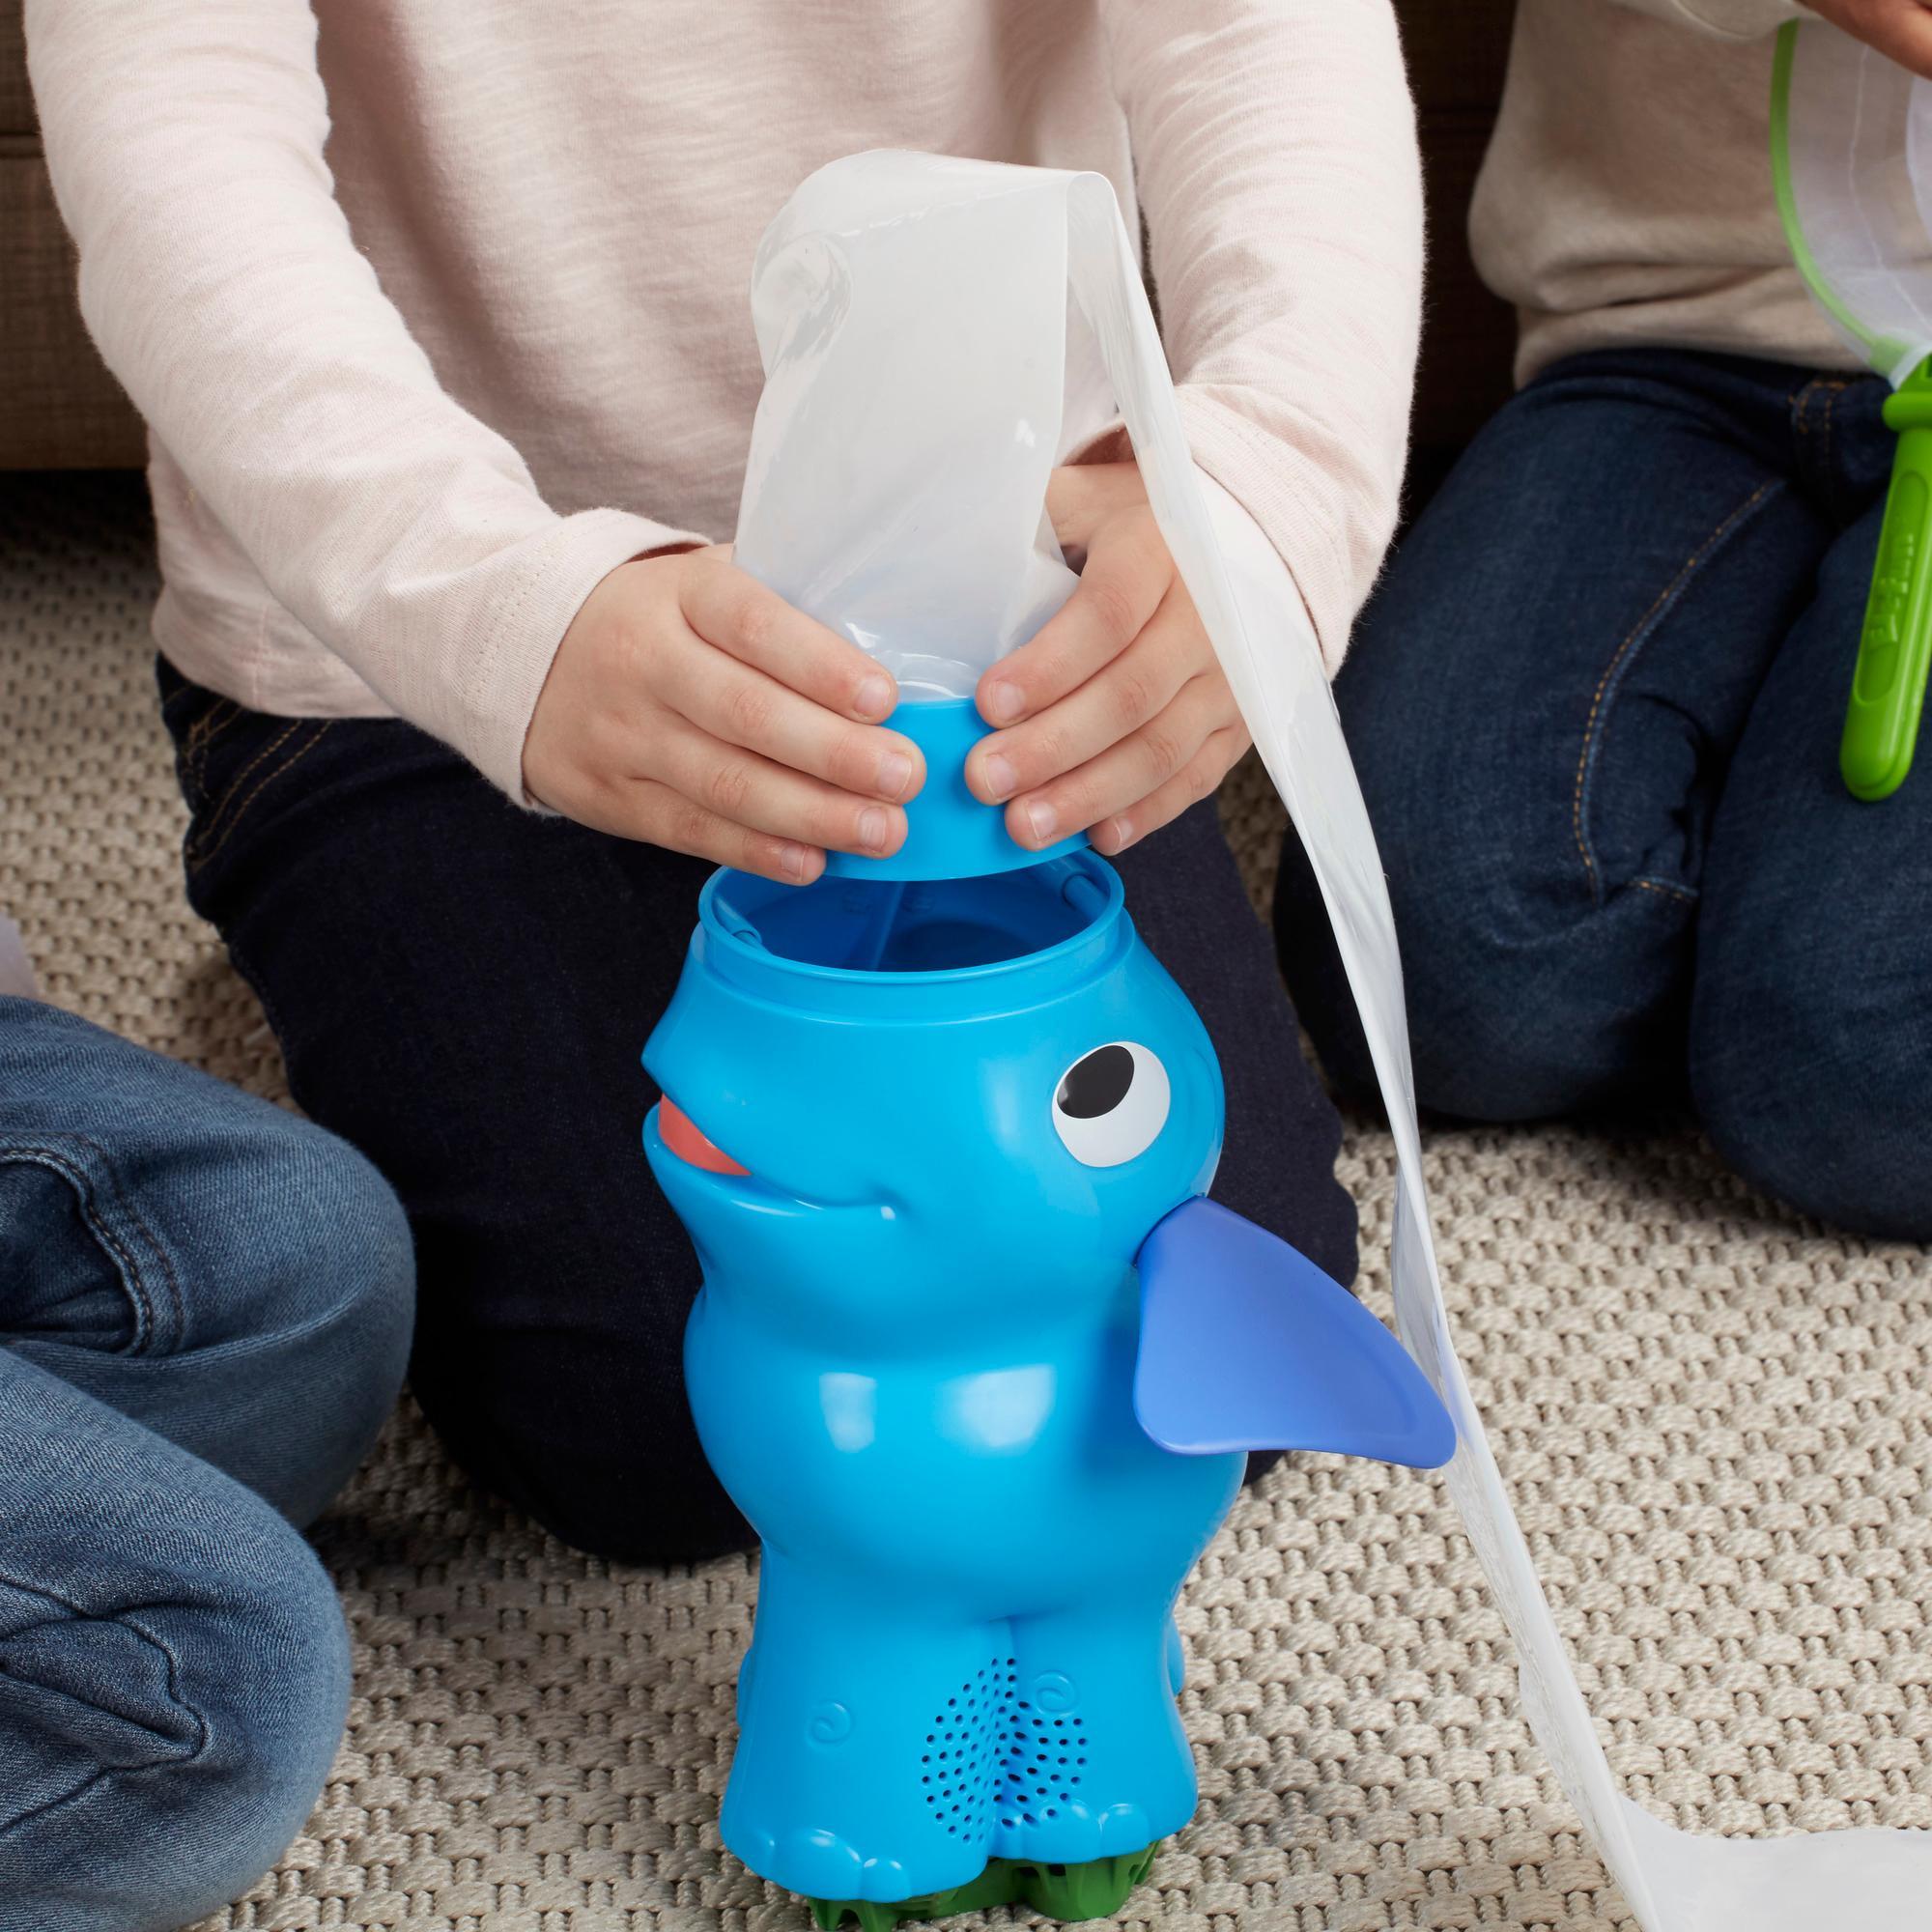 Amazon.com: Hasbro Elefun and Friends Elefun Game with ...